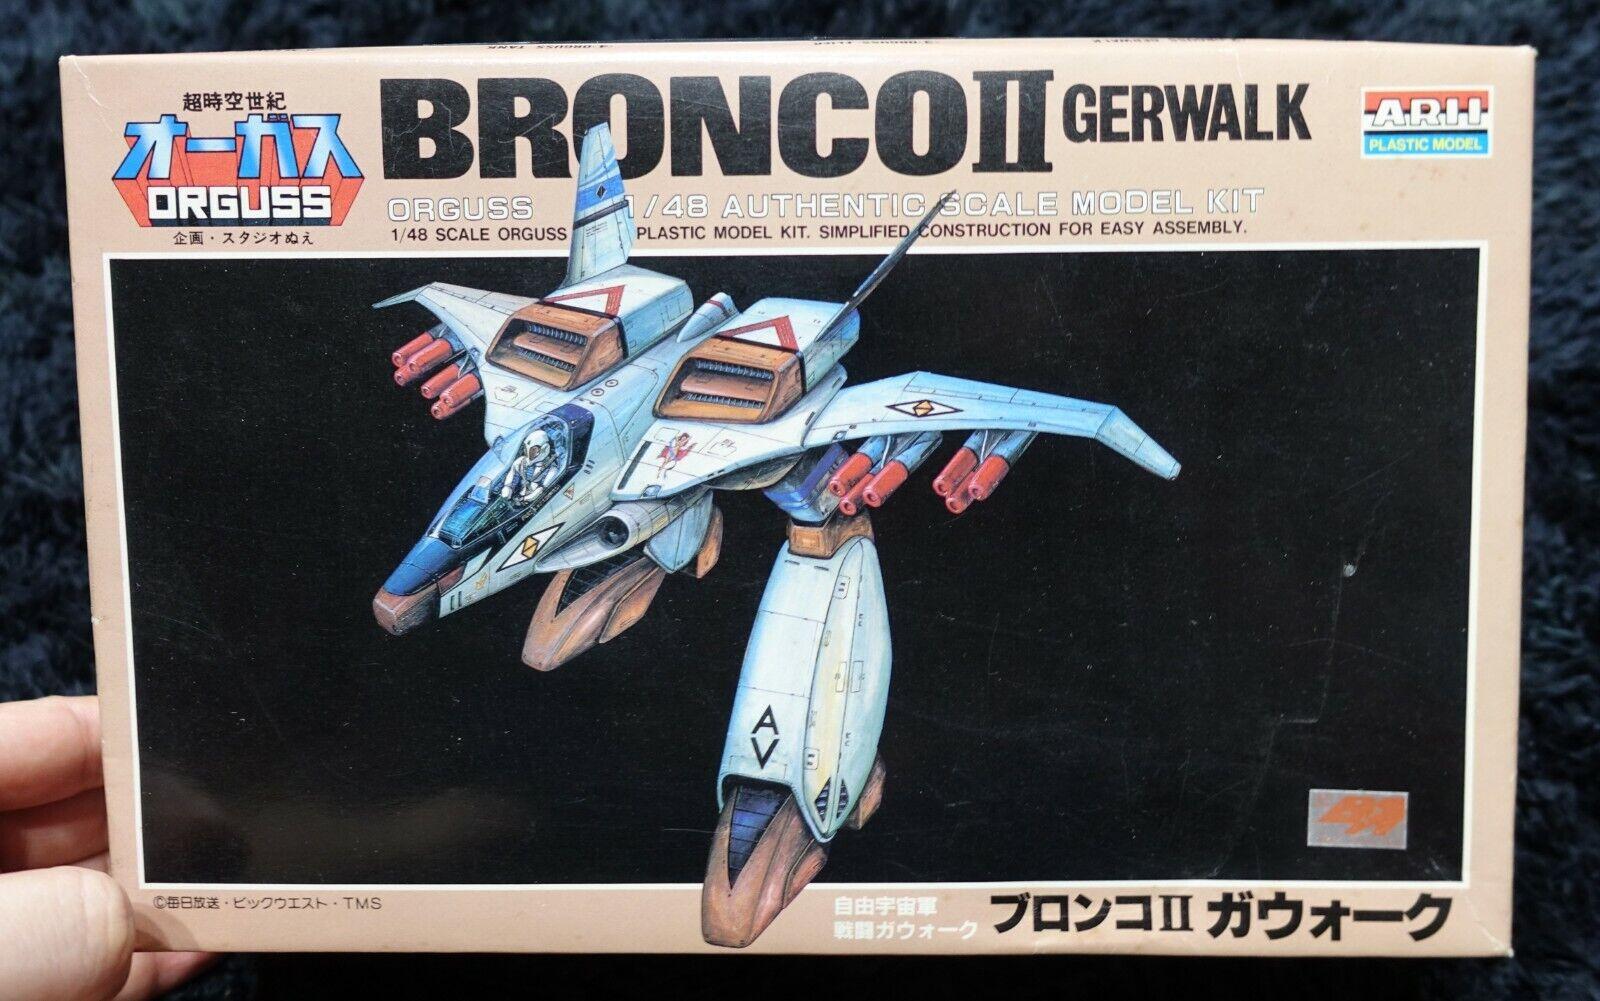 Super Dimension Century Orguss BRONCO II GERWALK  1 48 ARII MODEL KIT